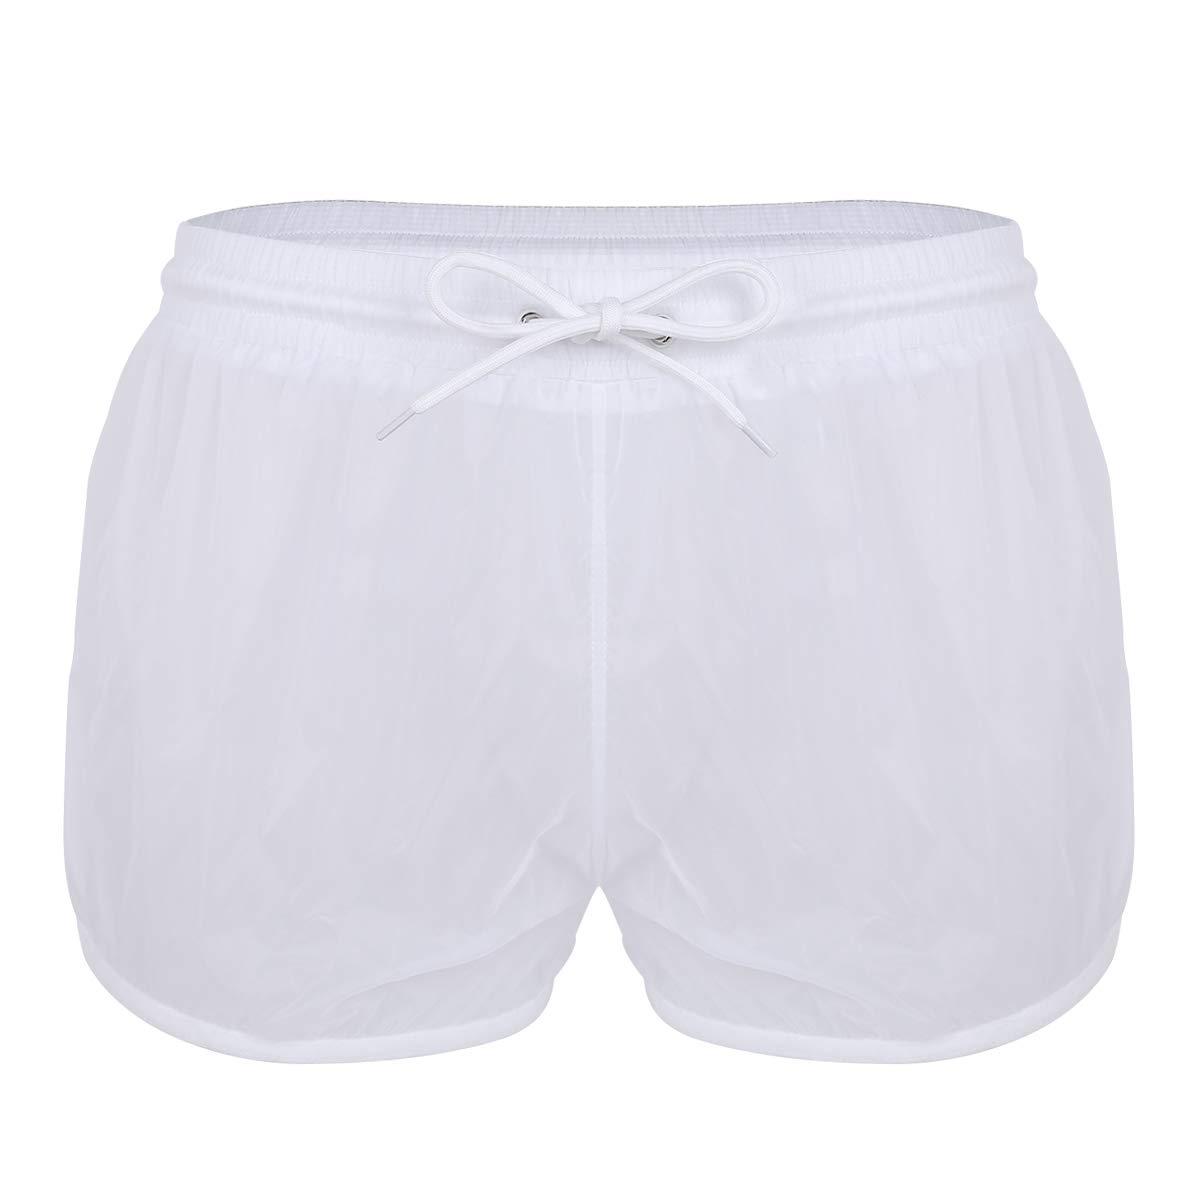 YiZYiF Men's See Through Beach Shorts Underwear Swim Trunks Watershort Lounge Pants